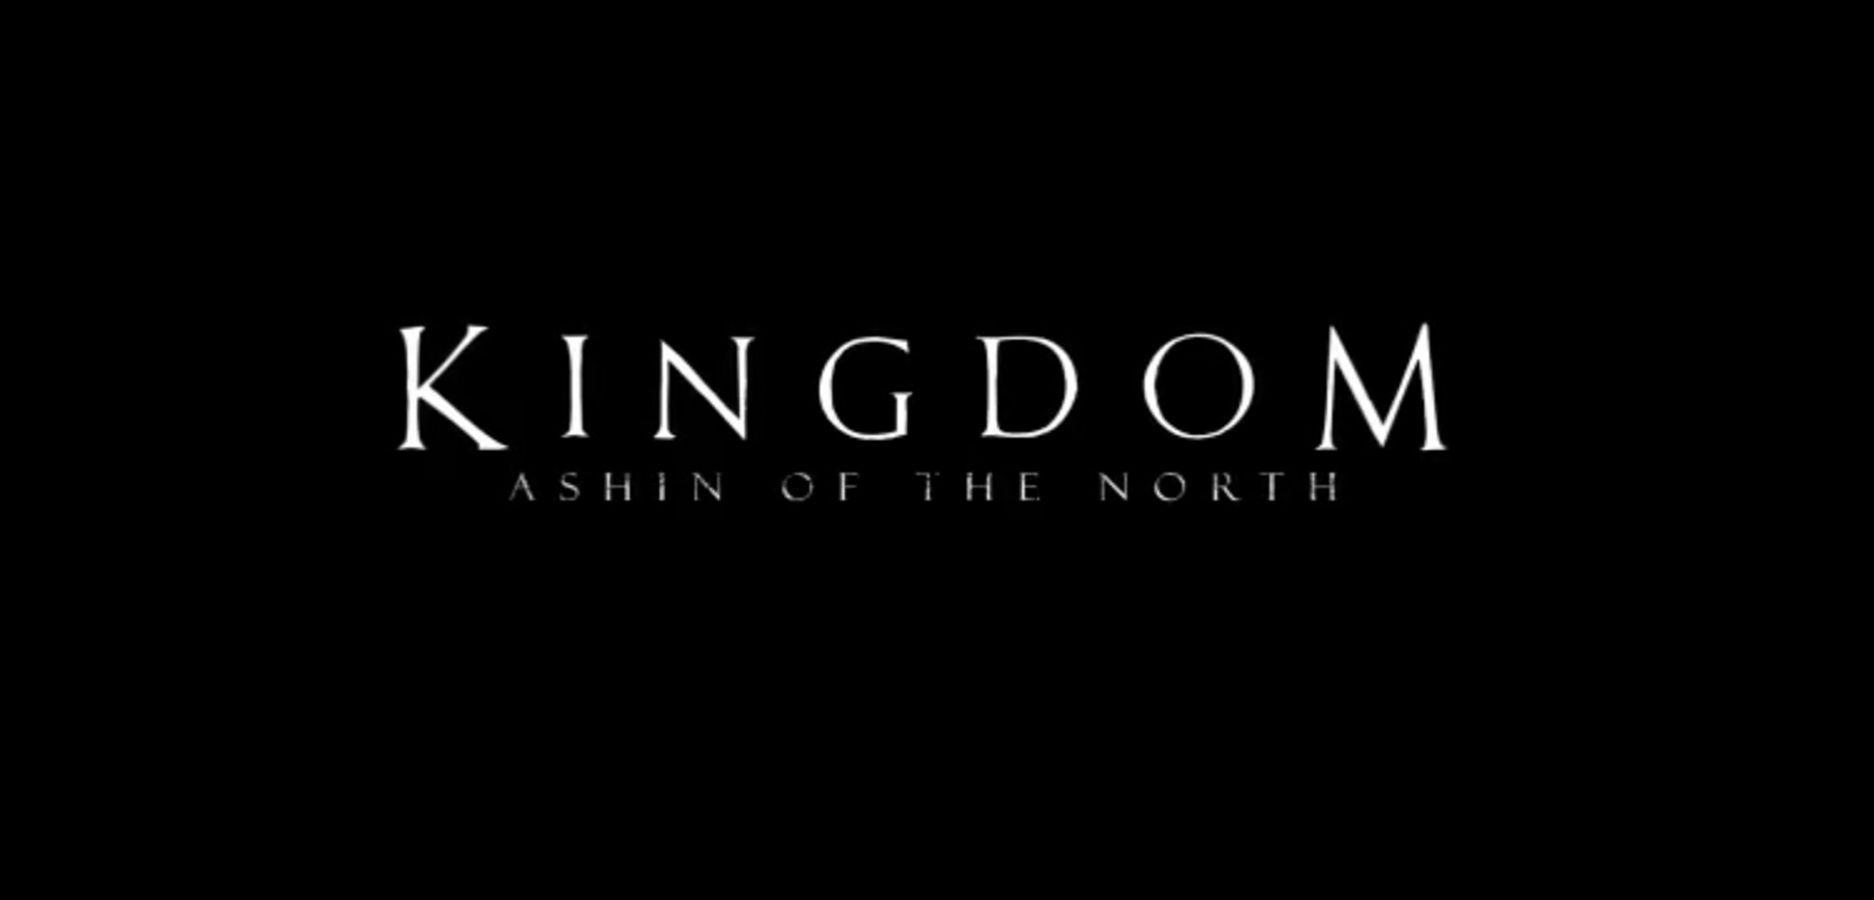 Ashin of the North